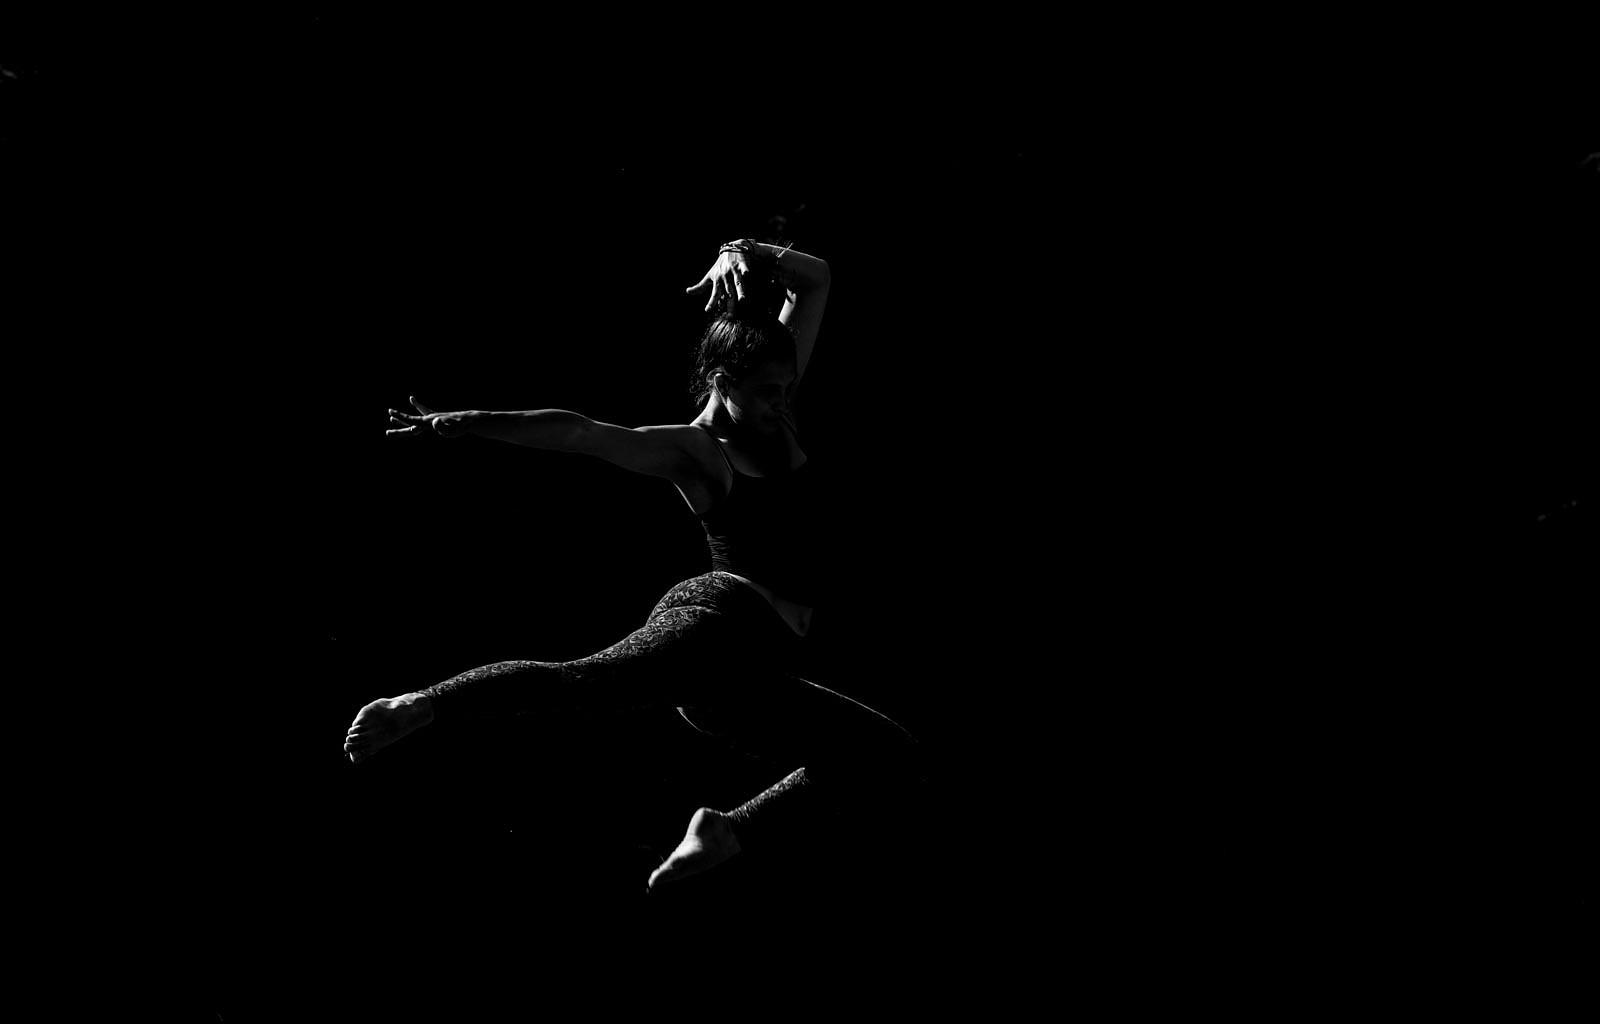 Daniel Mirlea WILDArt Ukraine © All rights reserved